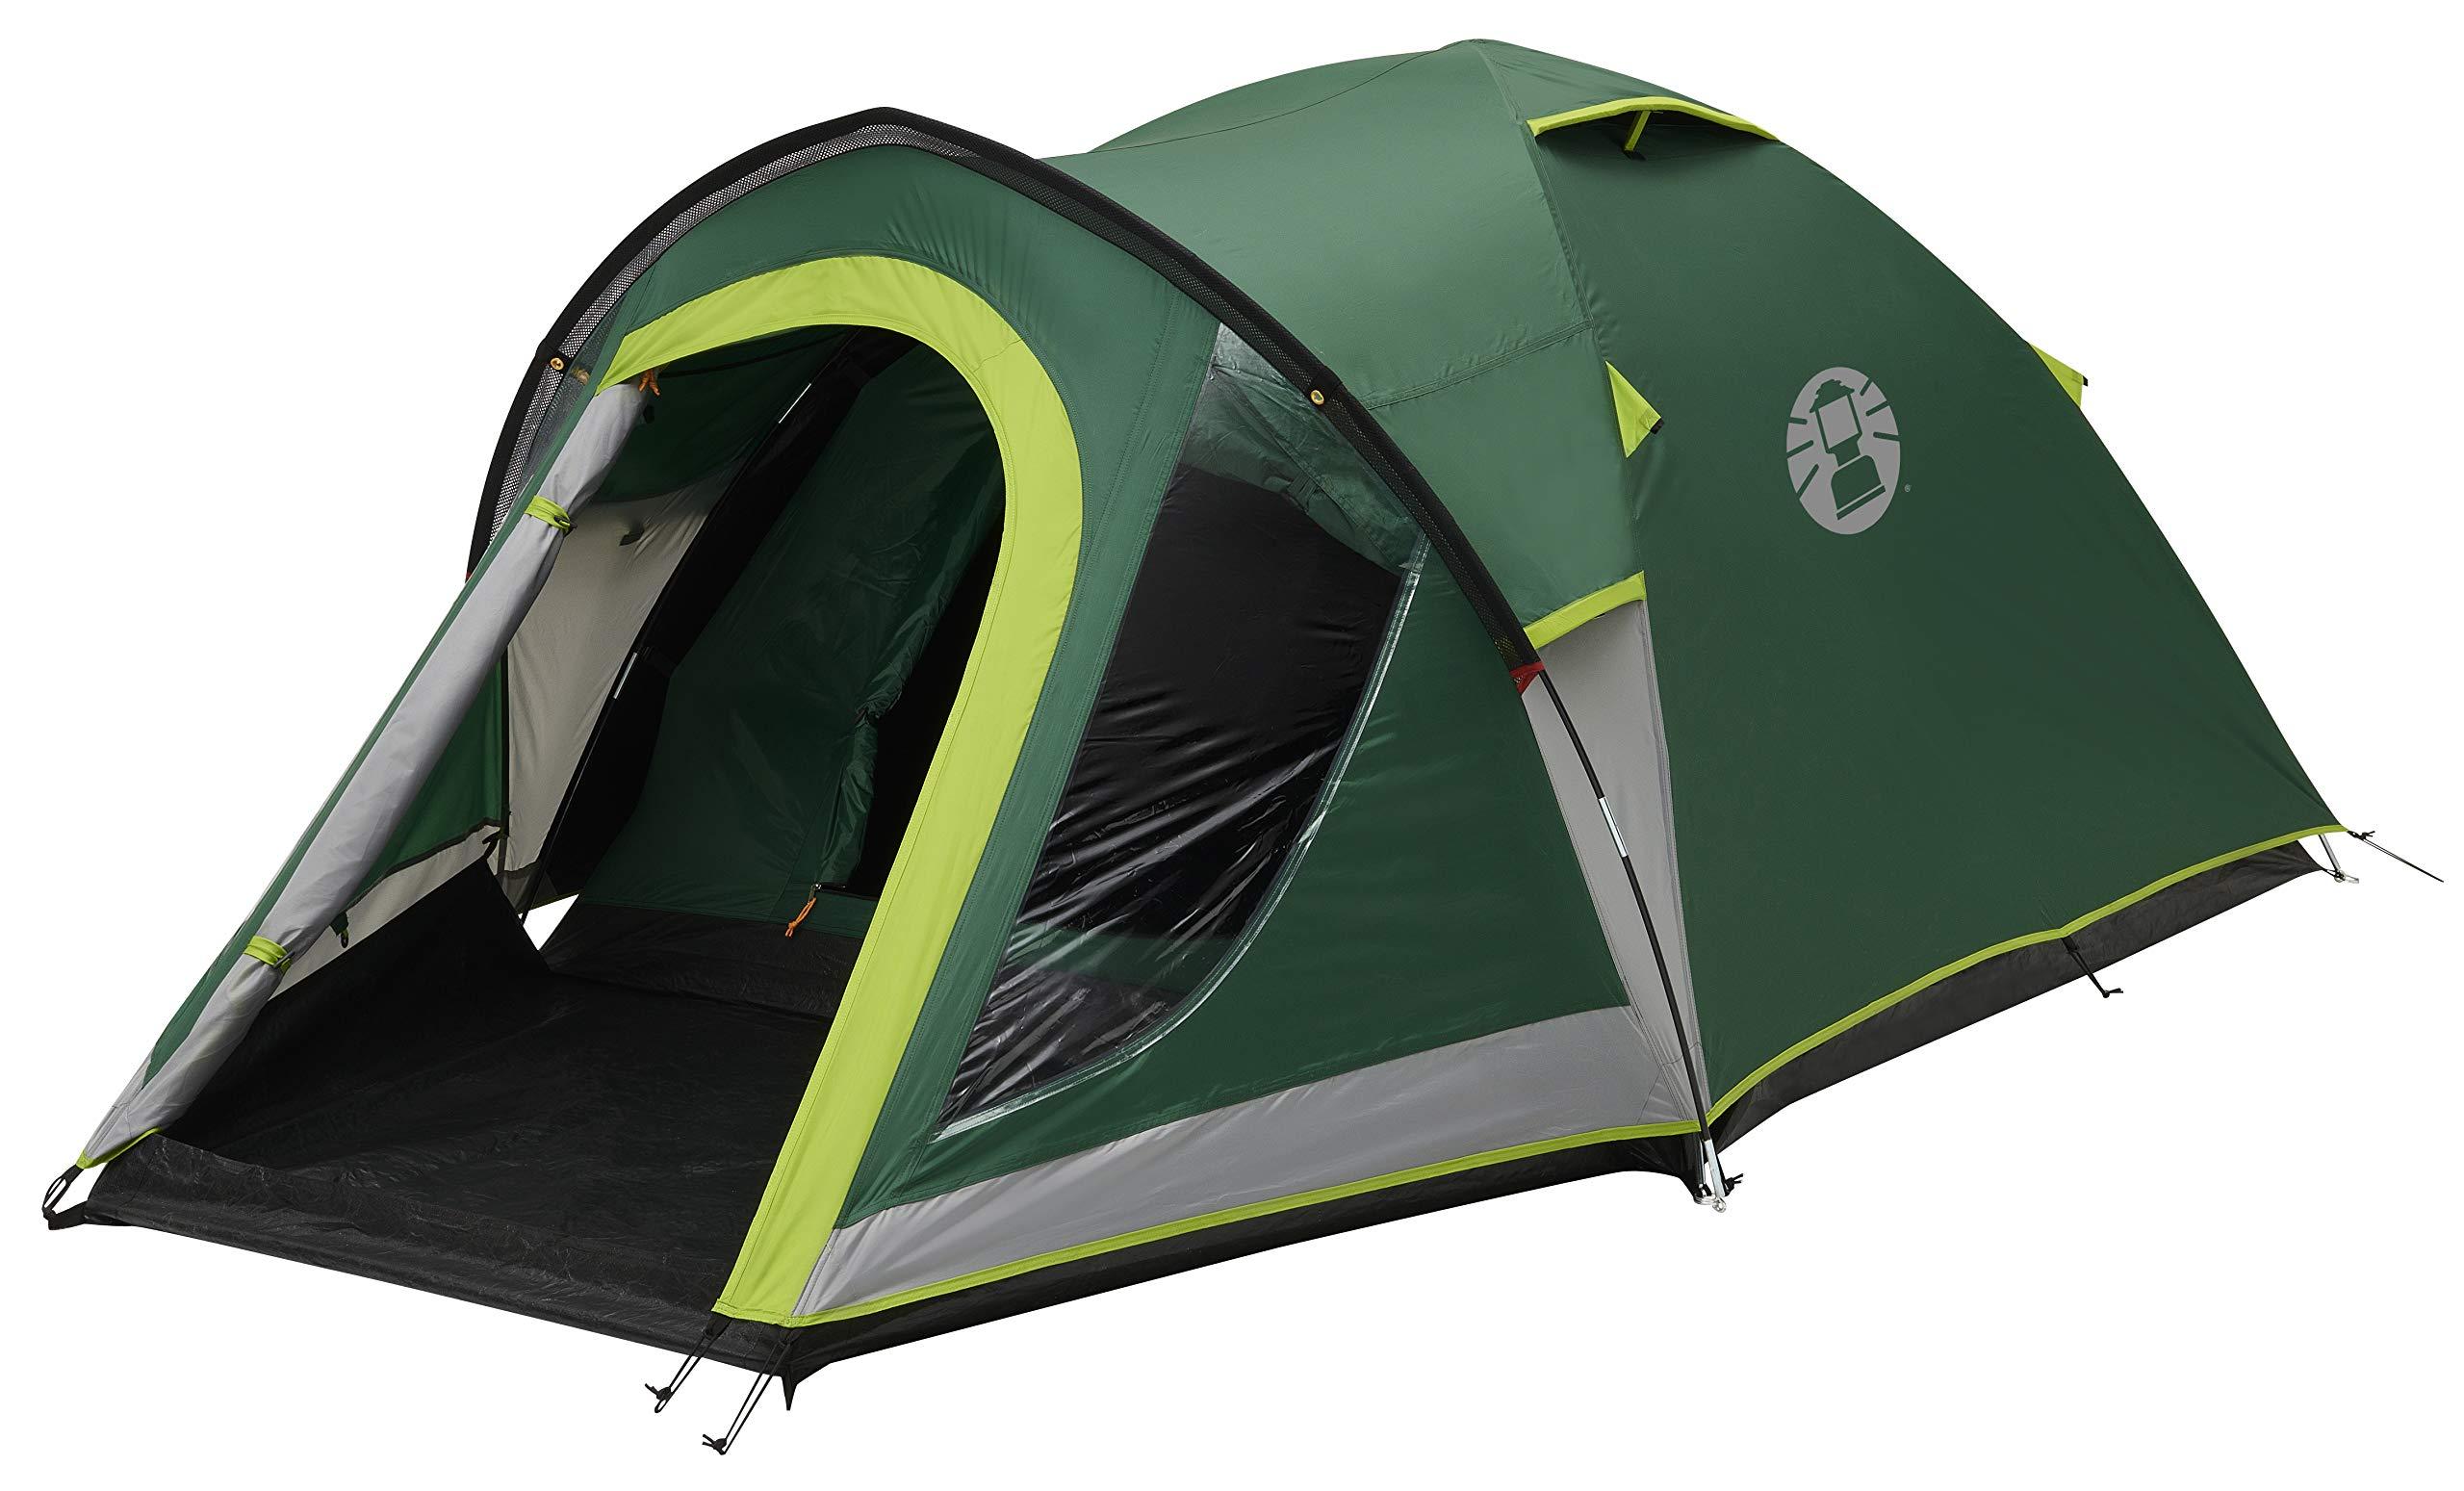 Coleman Kobuk Valley 4 tent £75 @ Amazon